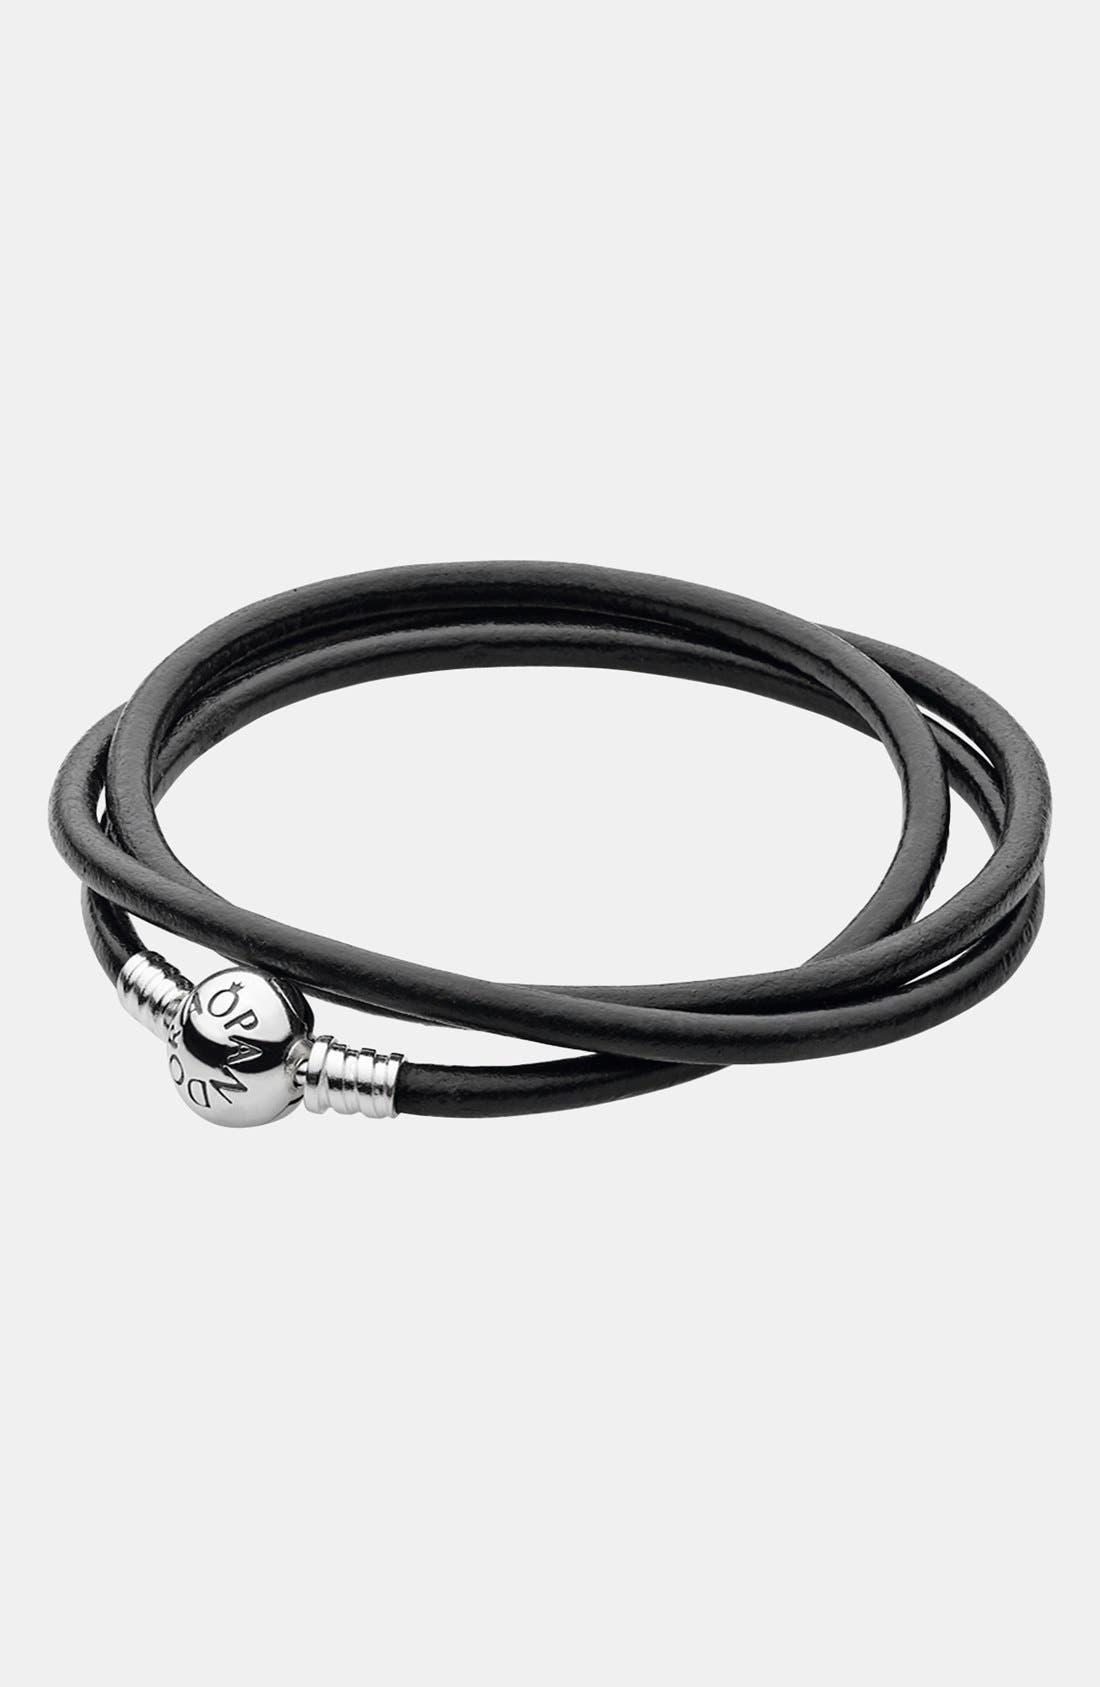 Alternate Image 1 Selected - PANDORA Leather Wrap Charm Bracelet